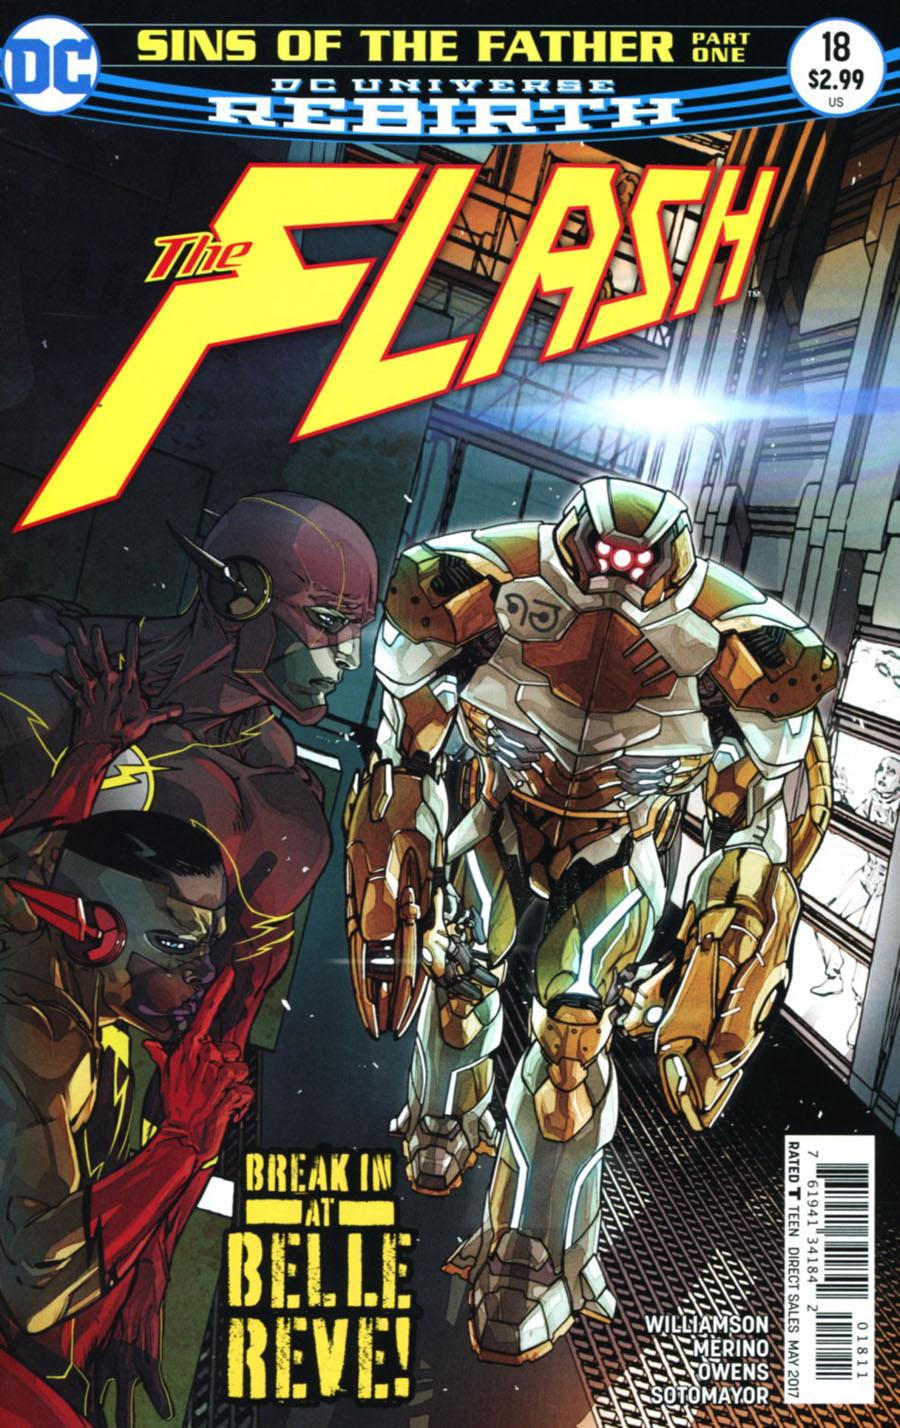 Flash Vol 5 #18 Cover A Regular Carmine Di Giandomenico Cover